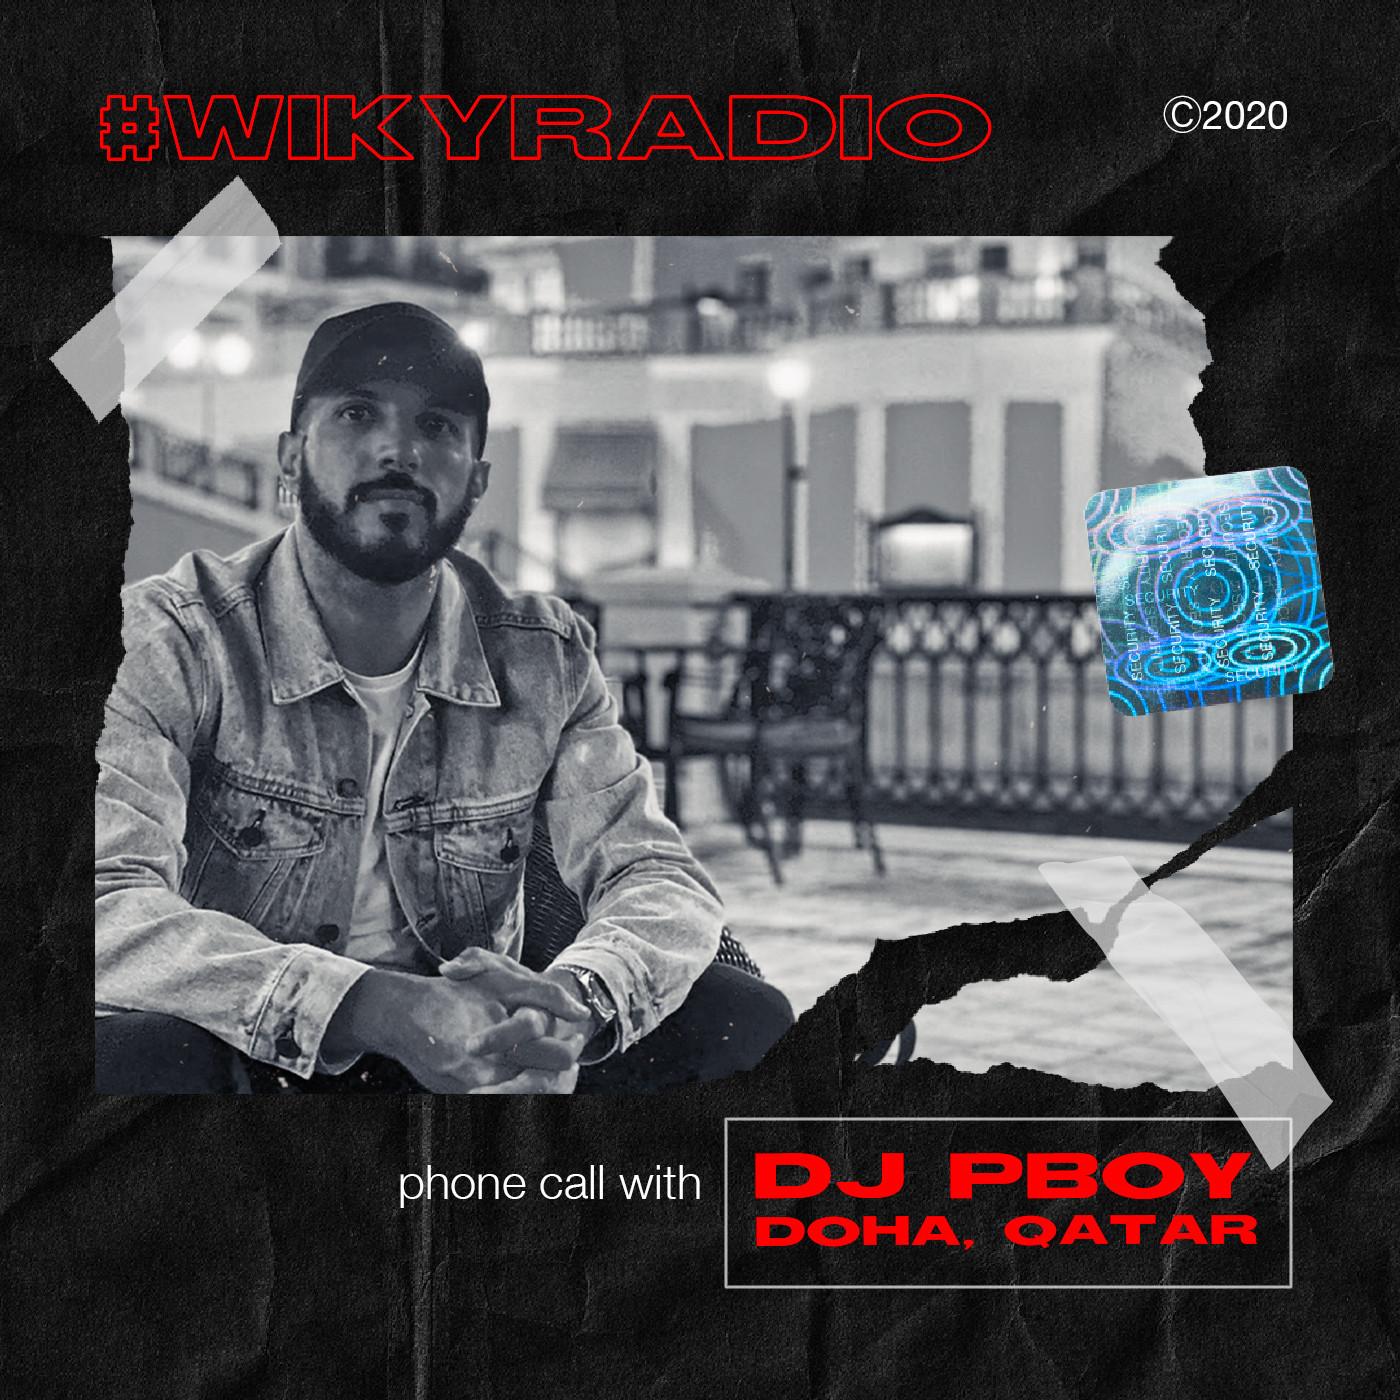 WIKY RADIO - PHONE CALL WITH DJ PBOY (DOHA,QATAR)